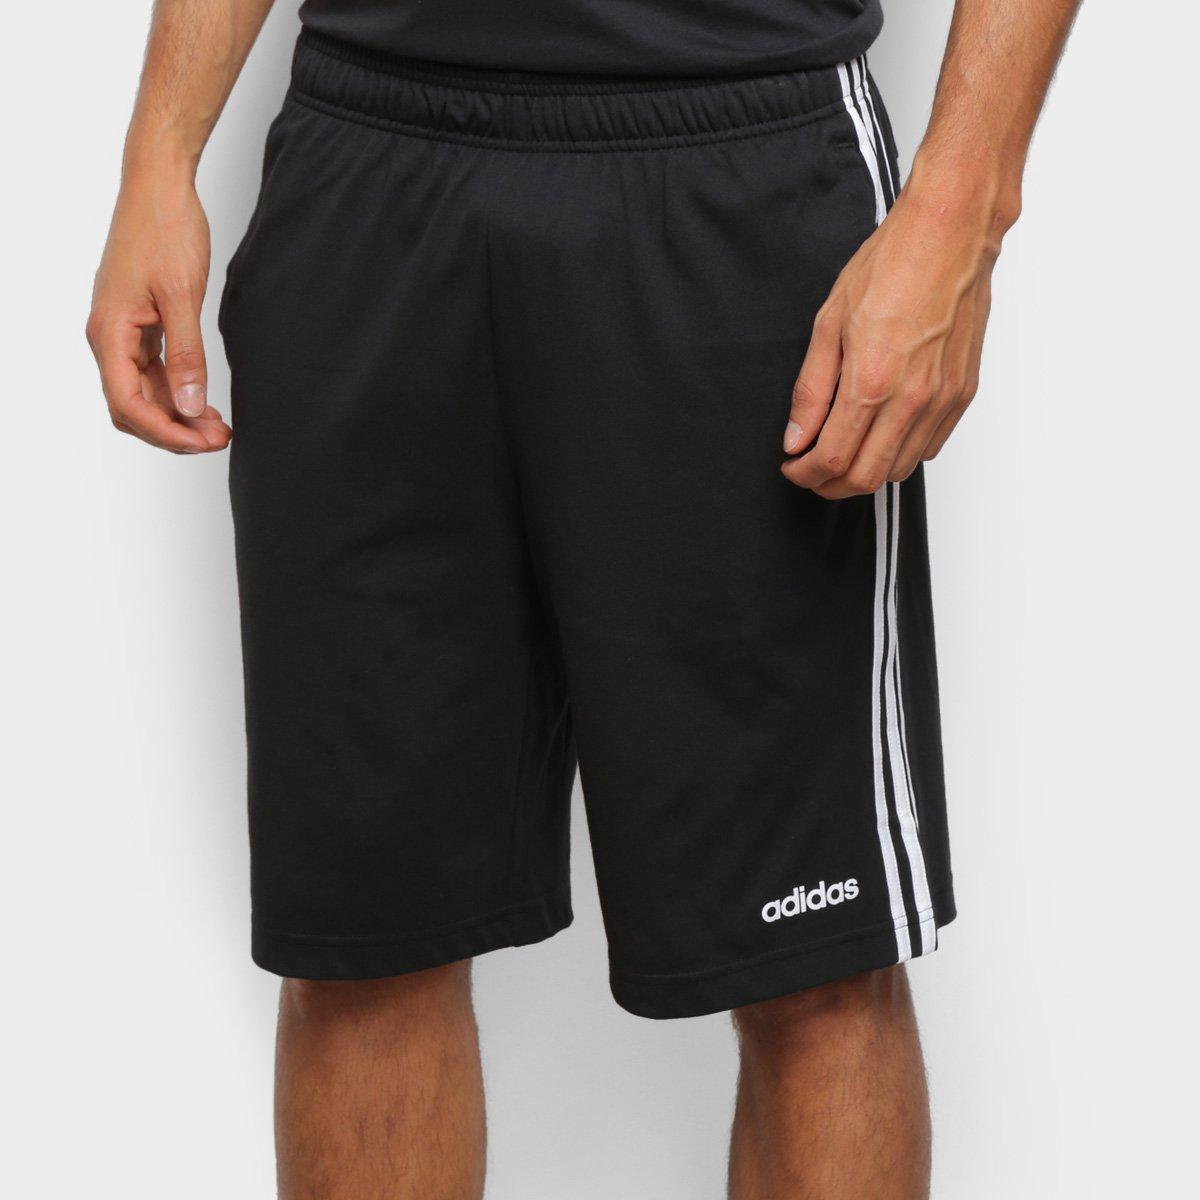 Short Adidas E 3 Stripes SJ Masculino